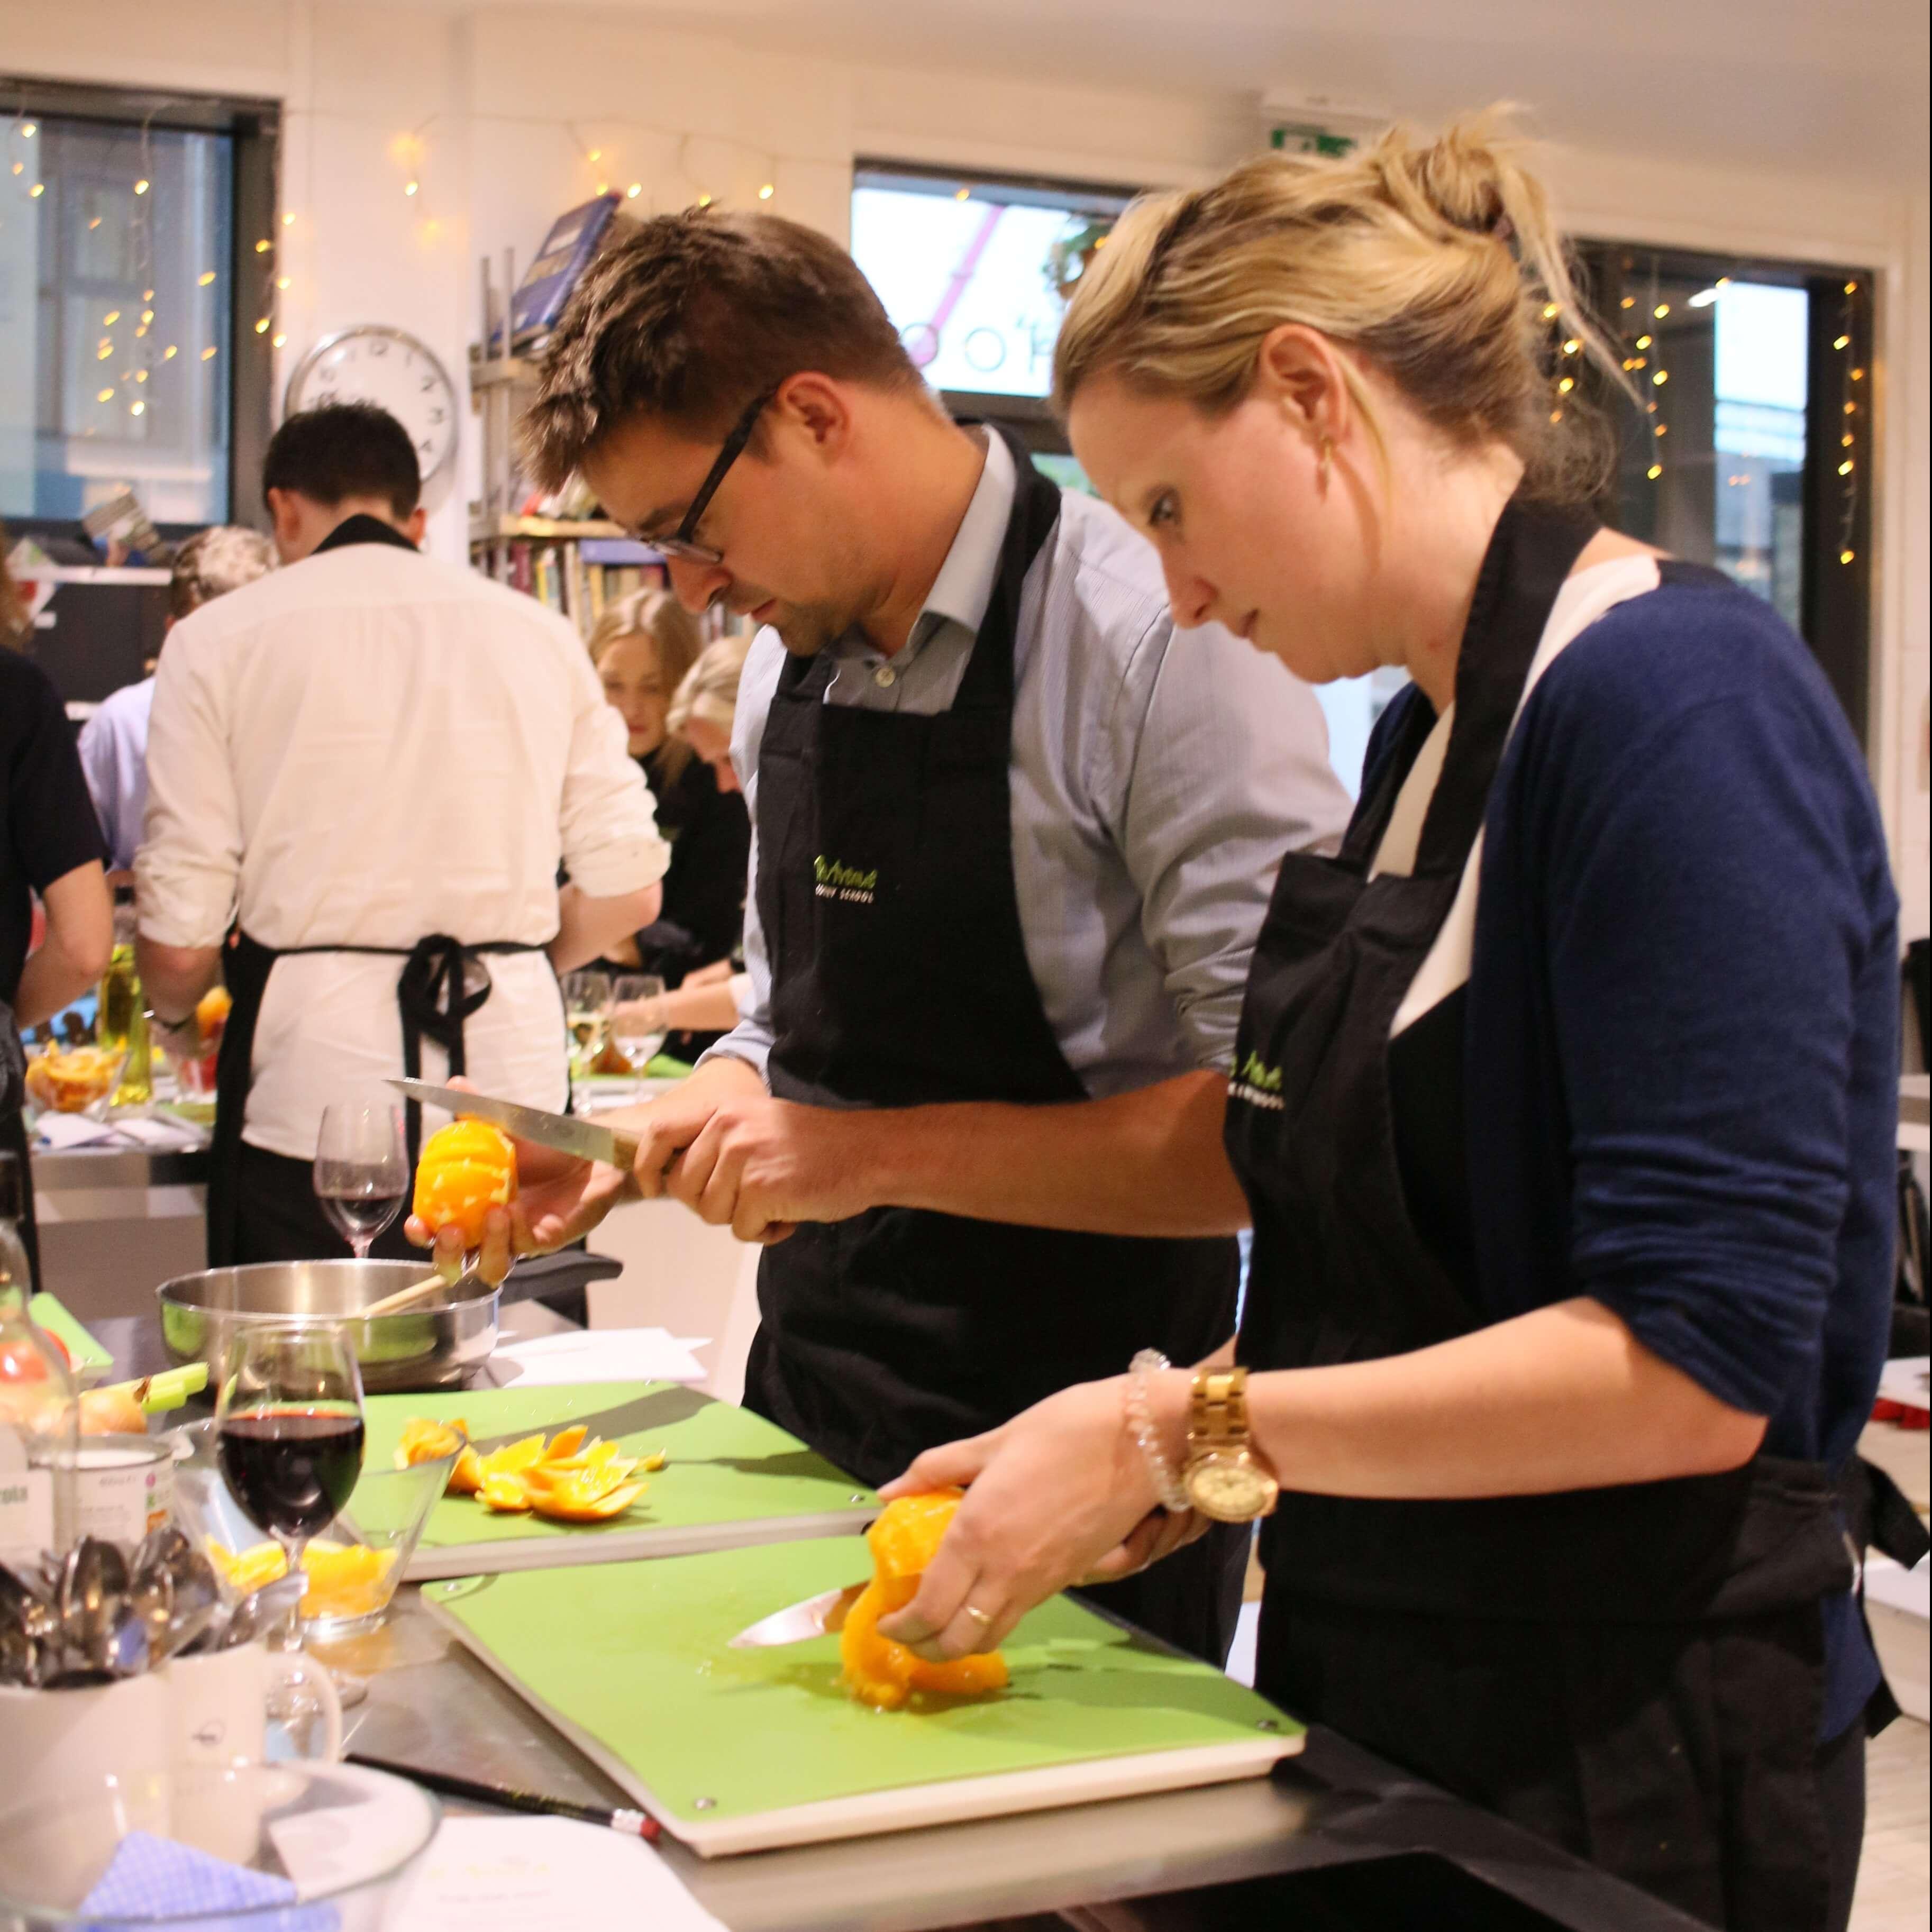 Kitchen Window Knife Skills Class: The Avenue Cookery School